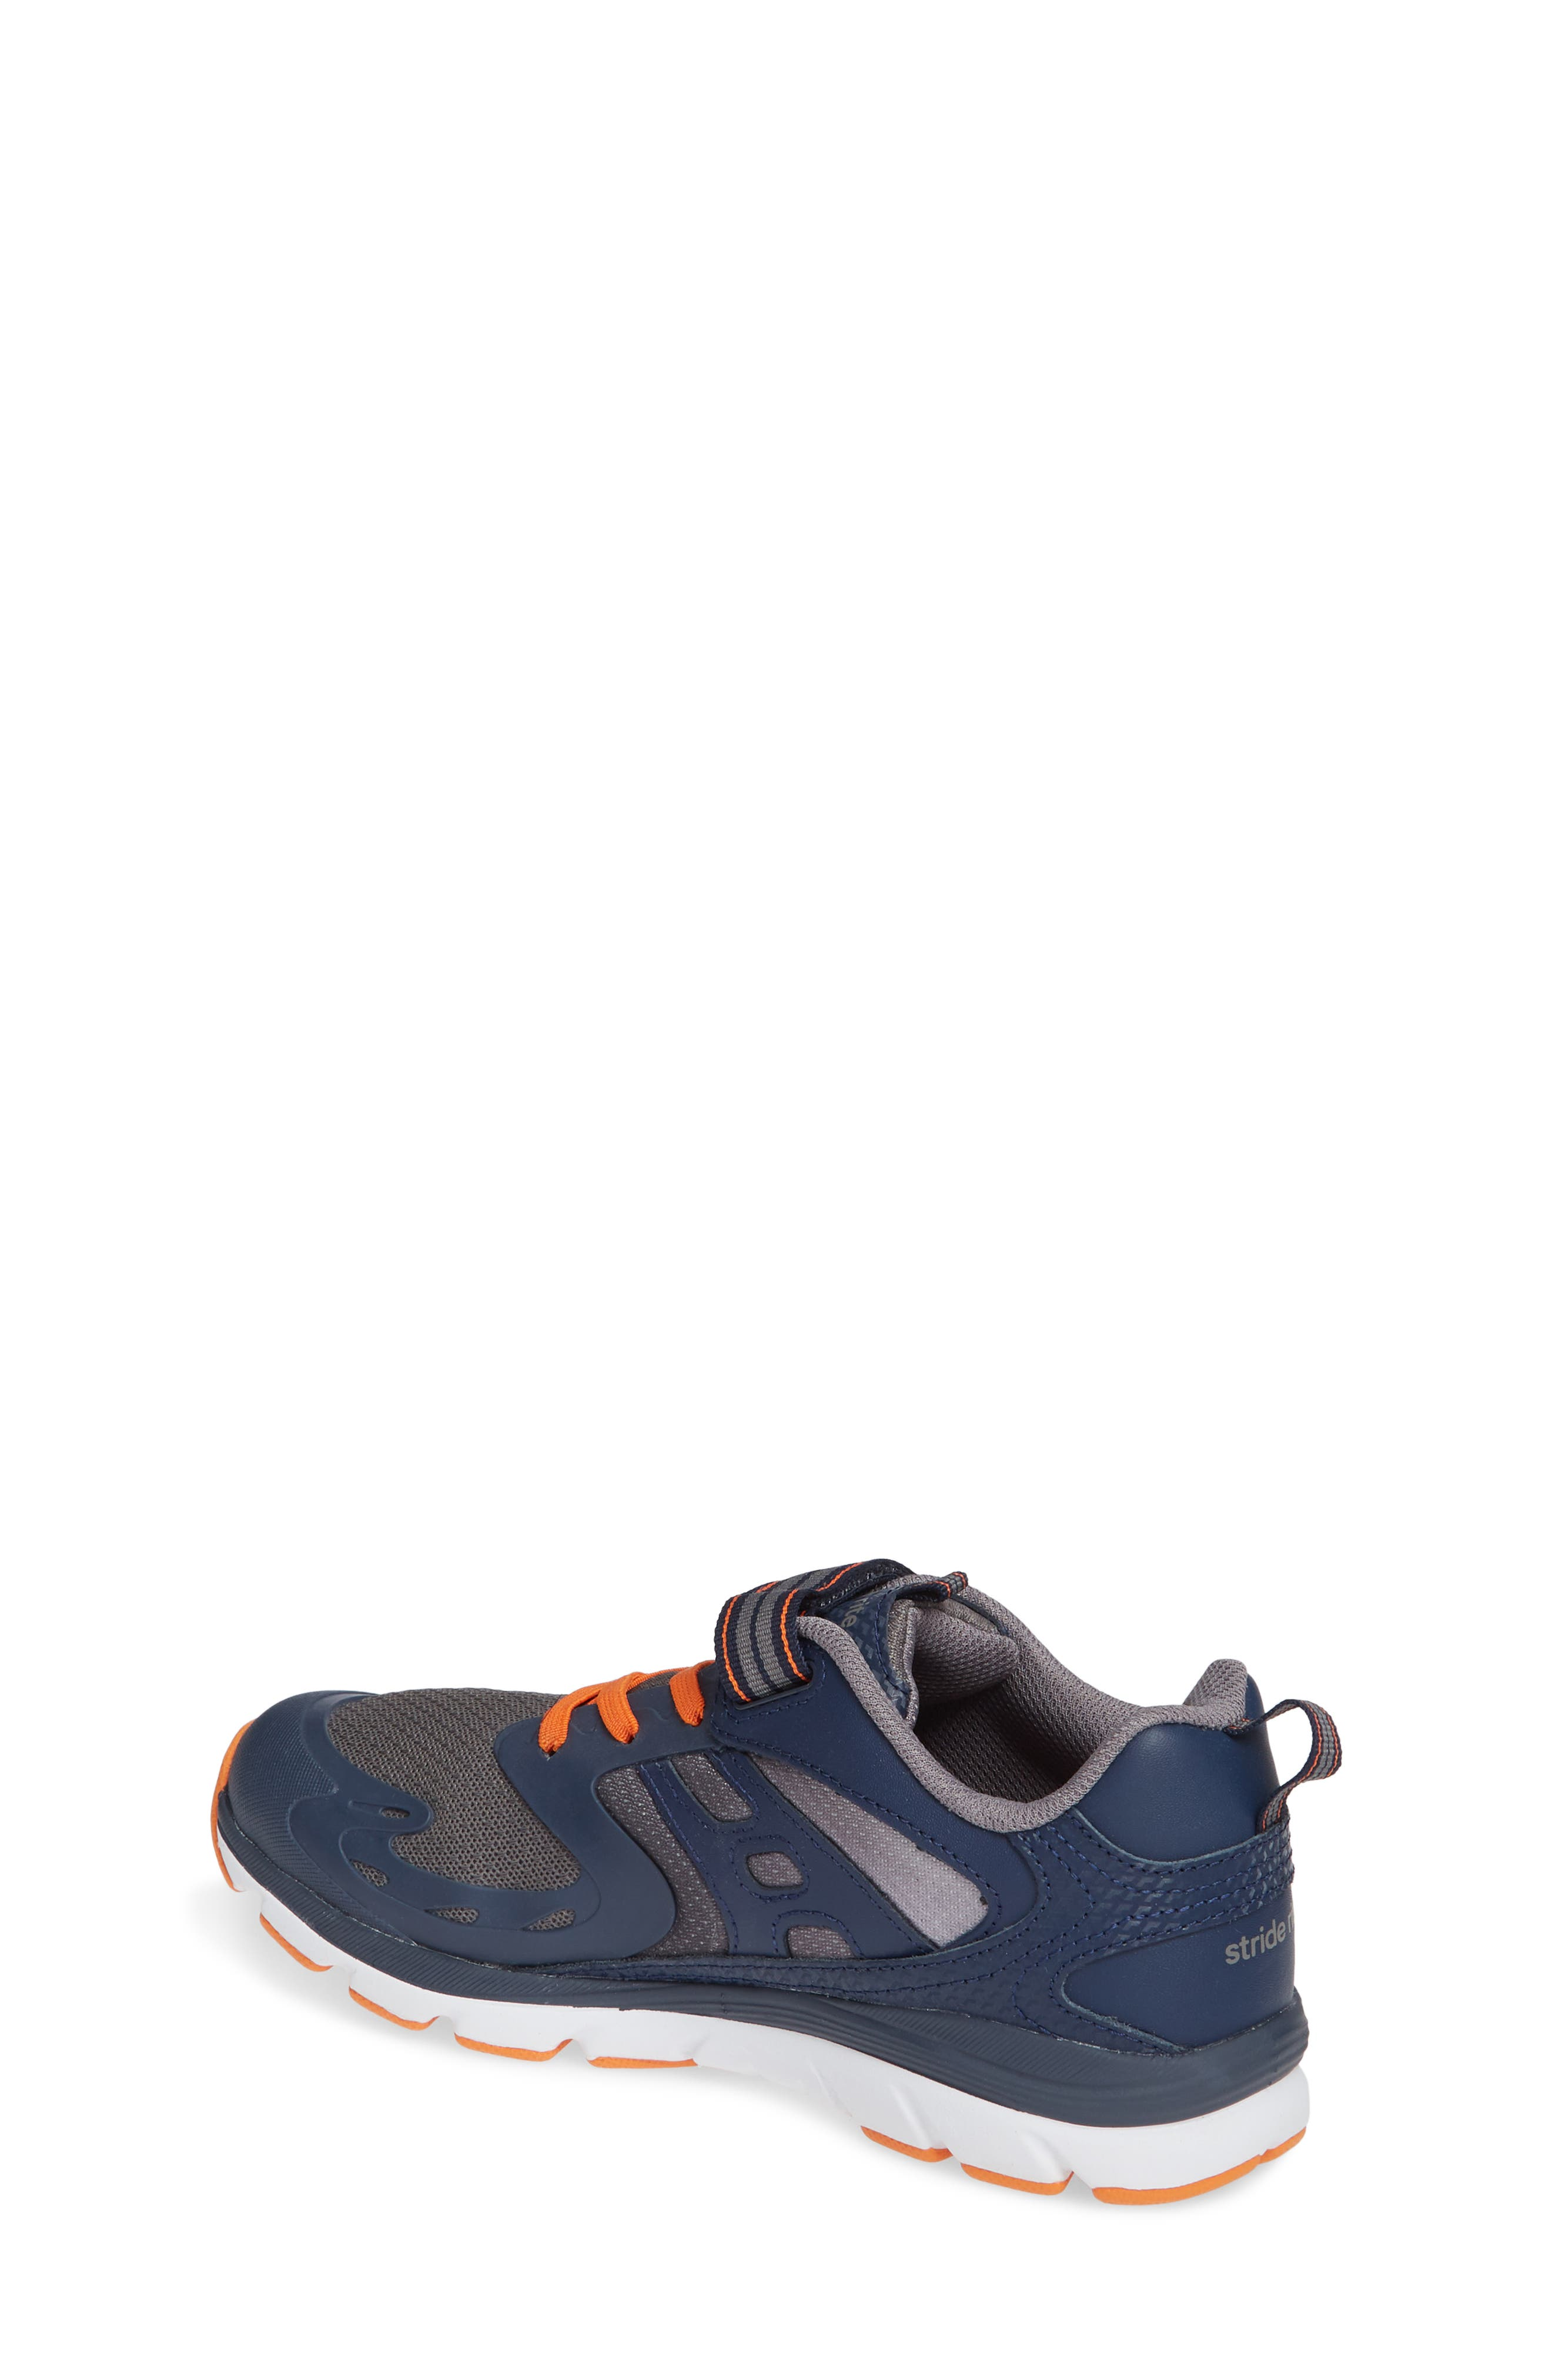 Made 2 Play Breccen Sneaker,                             Alternate thumbnail 2, color,                             NAVY/ ORANGE